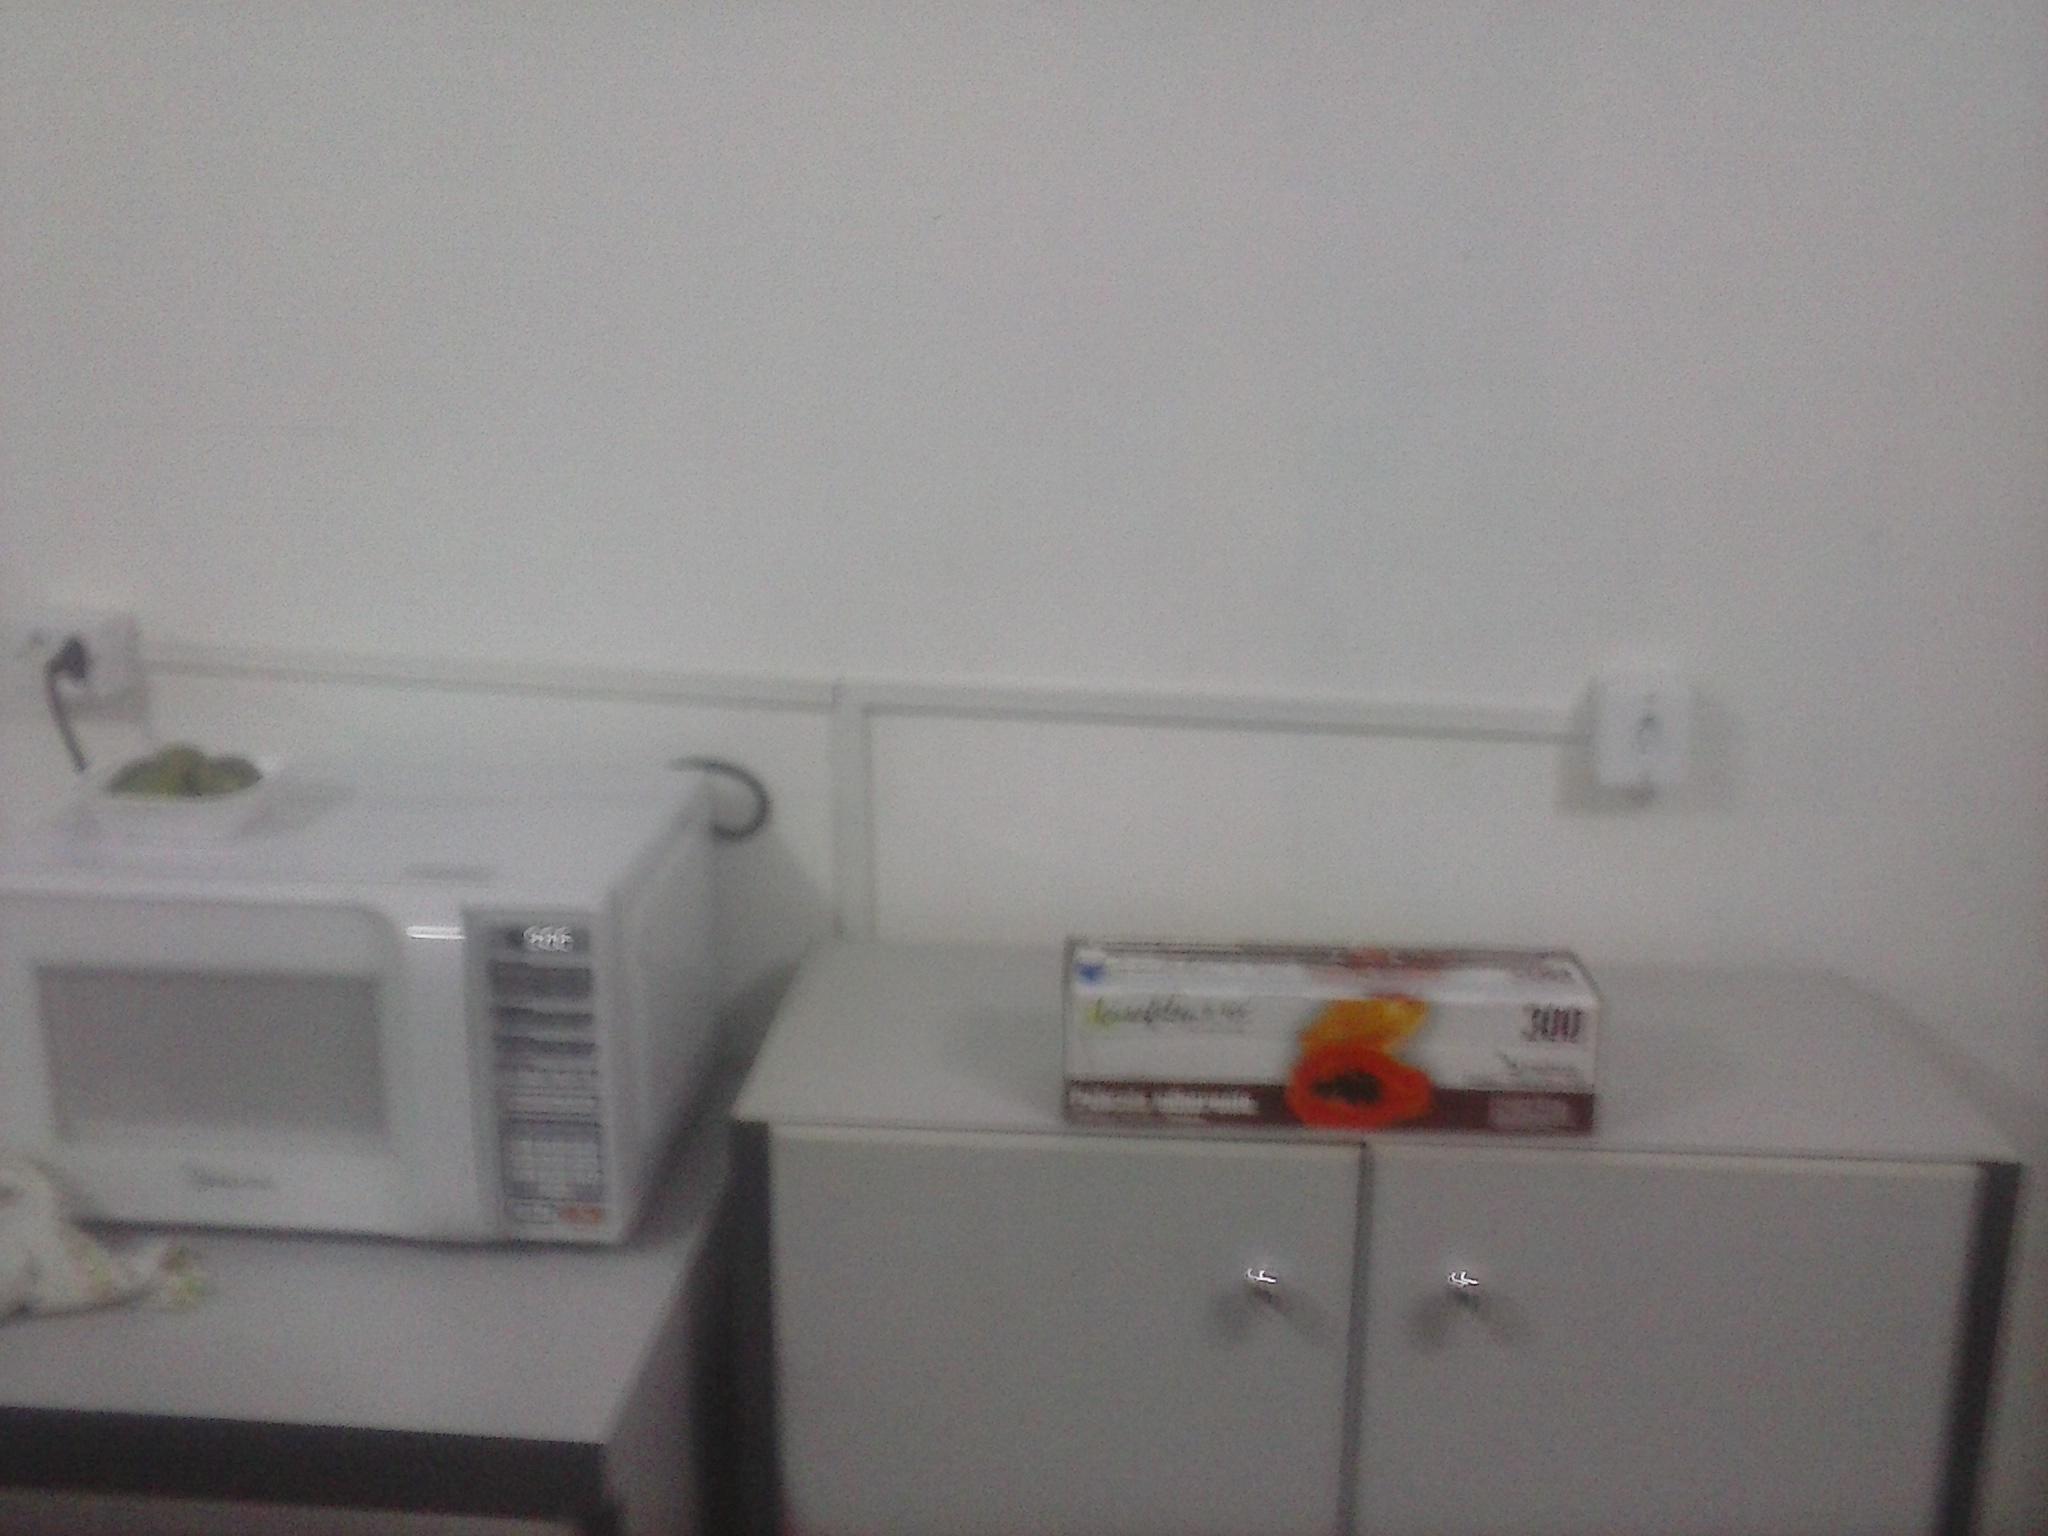 Instala Es El Tricas Em Santo Andr Cozinha Industrial Empresa